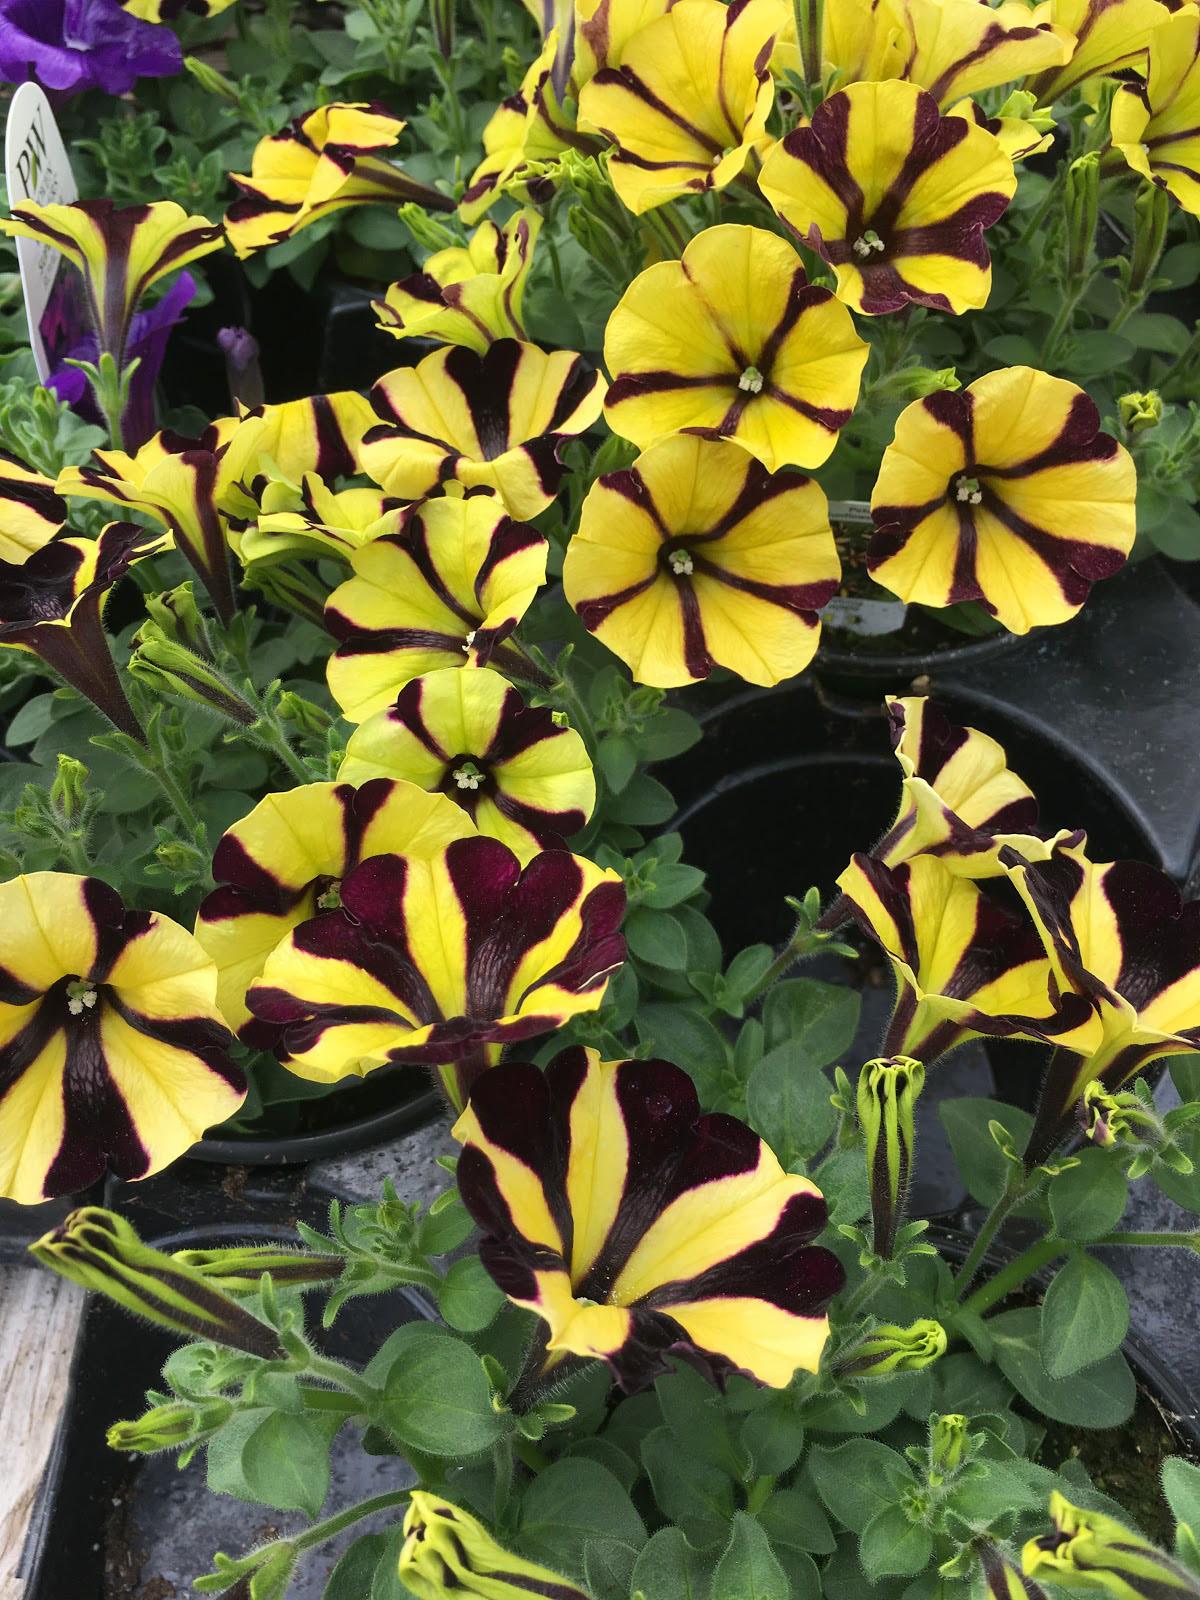 Green House, Garden Center, Westchester Flower Shops, Indoor Plants, Outdoor Plants, NY Nurseries, Nursery, Landscaper, Florist.